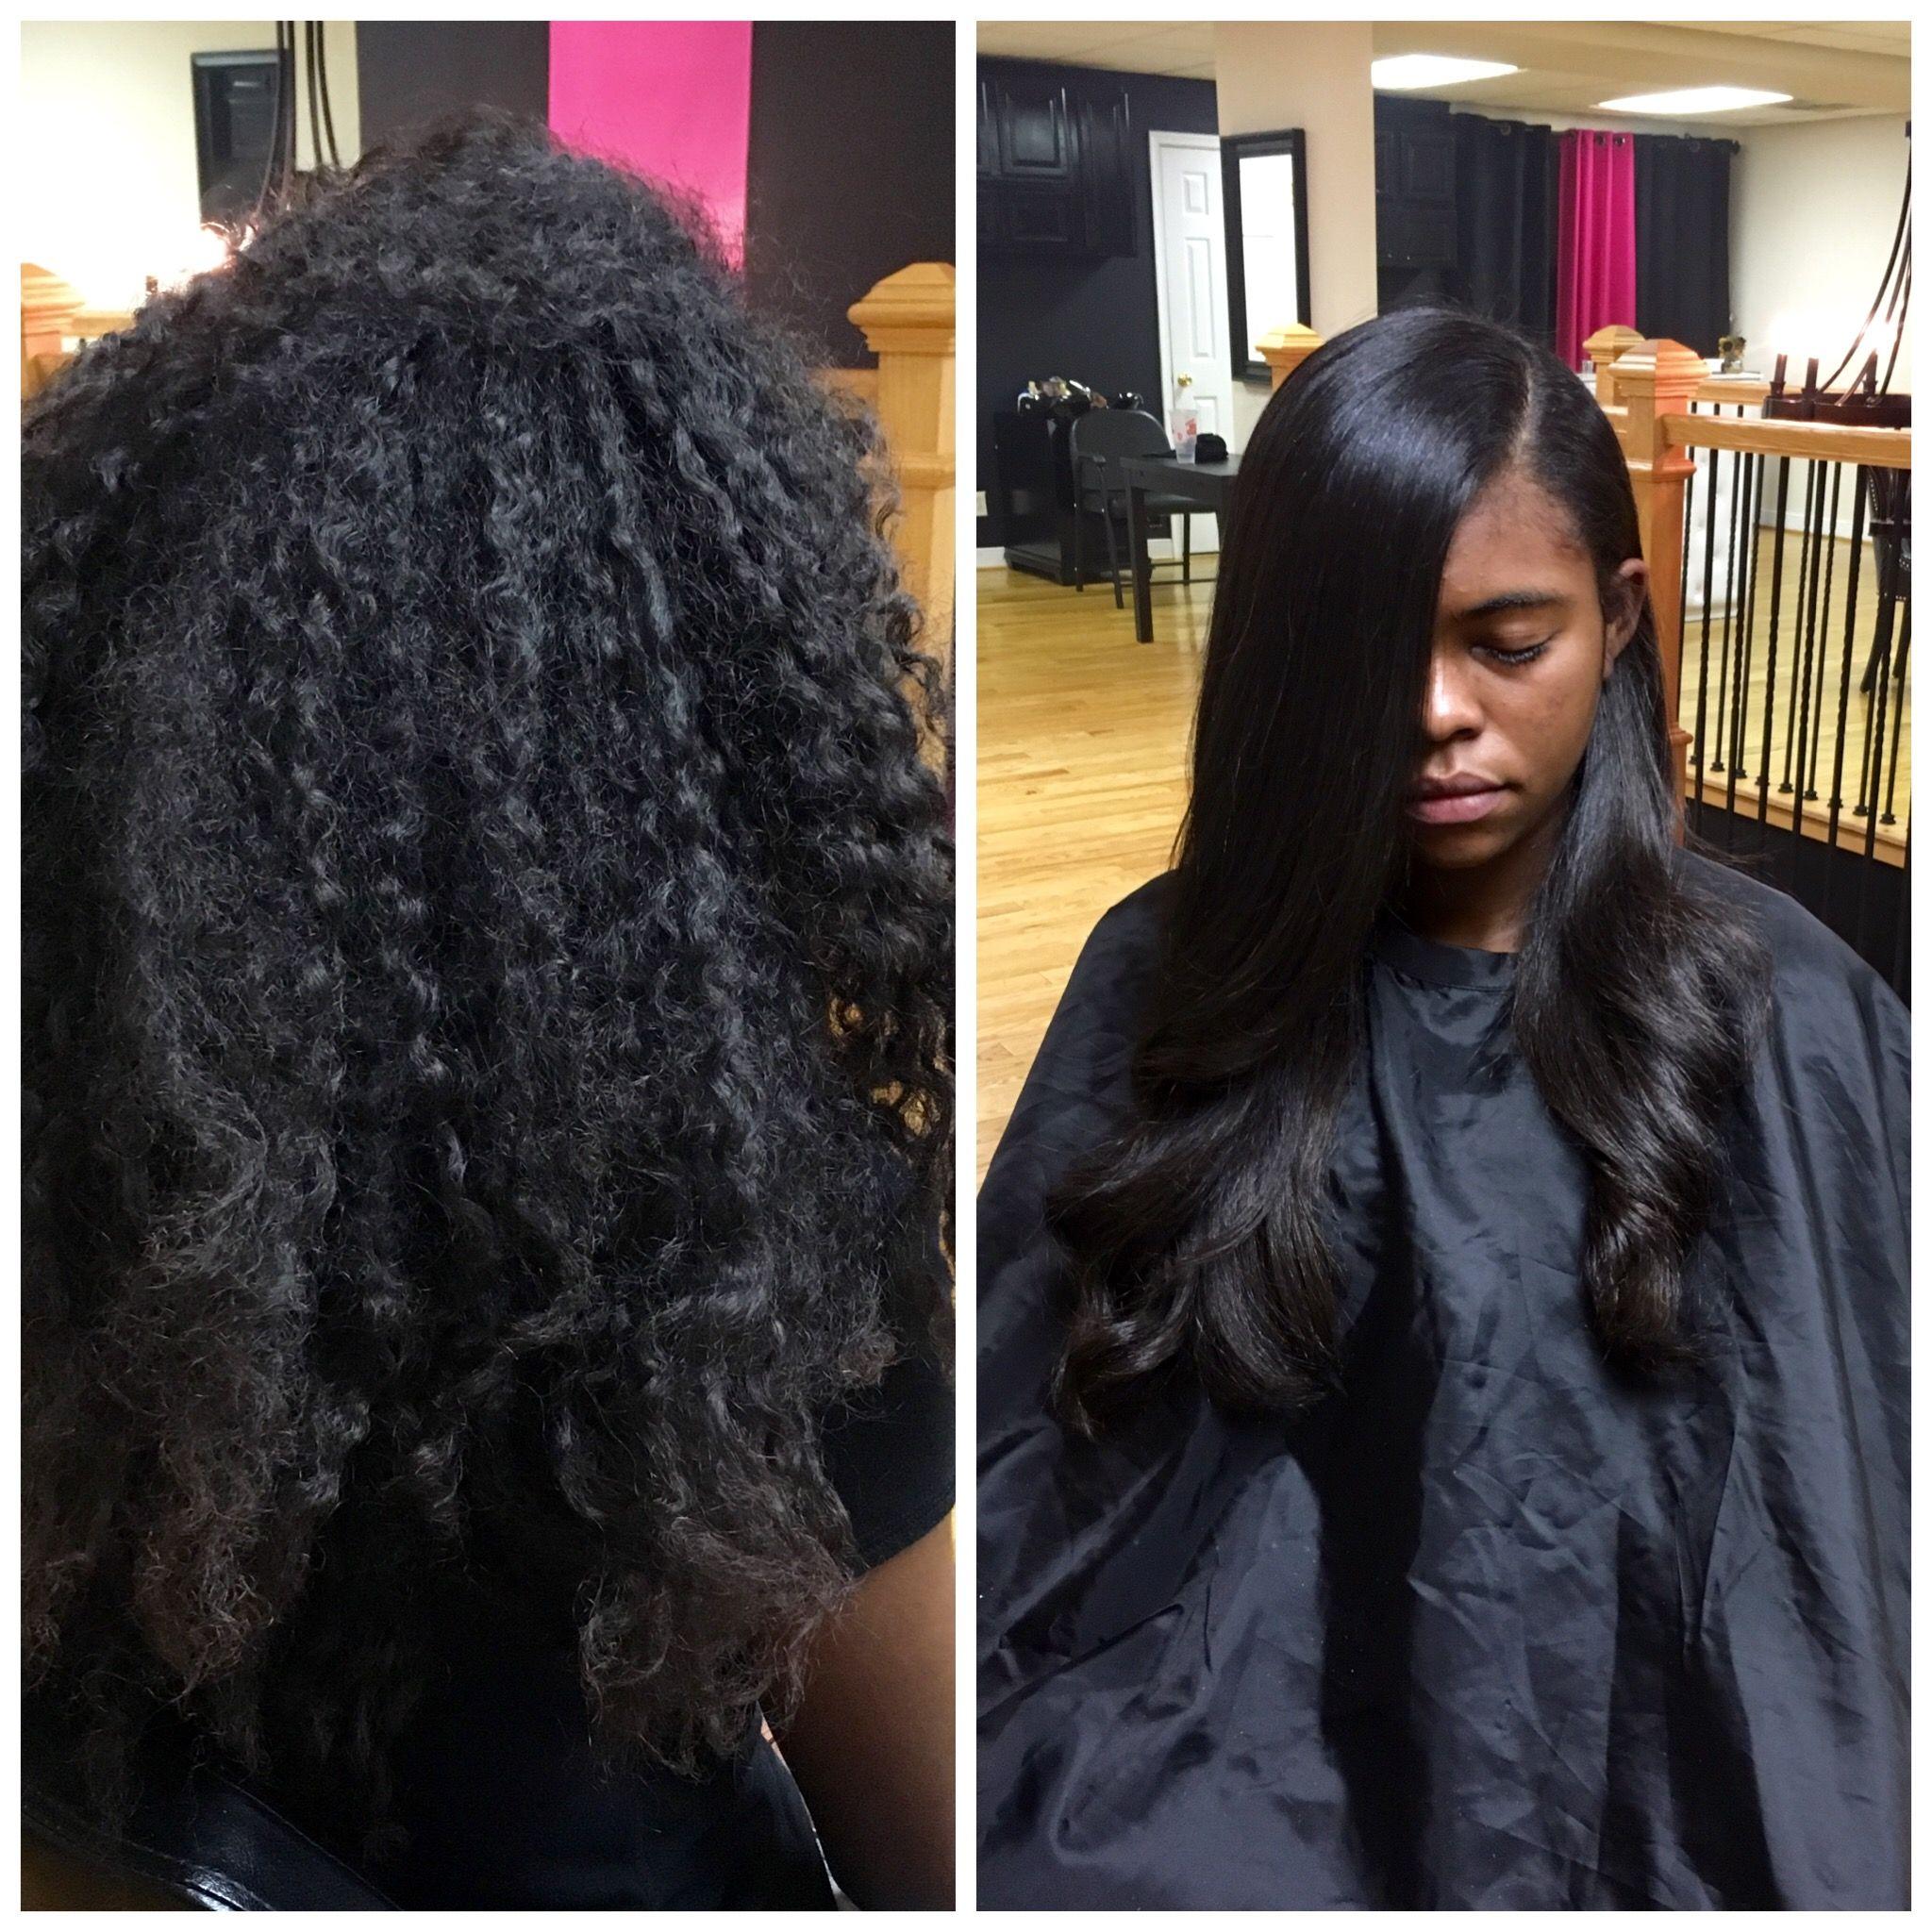 Natural Hair Silk Press 11e Chesapeake Ave Towson Md Pinkandblackhairstudio Com Natural Hair Silk Silk Press Natural Hair Hair Styles